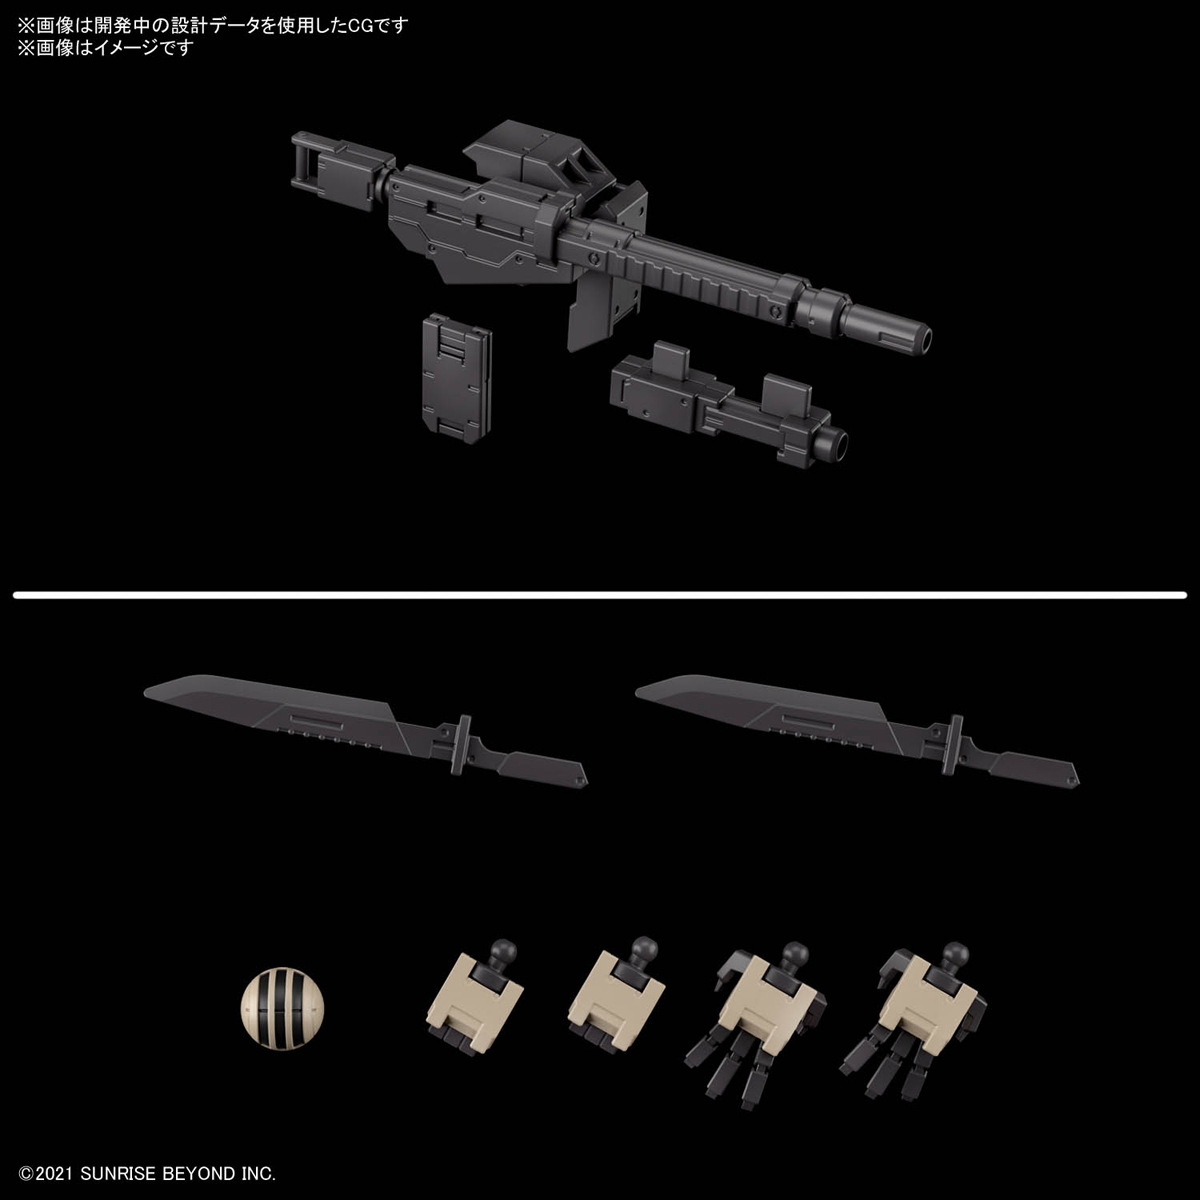 HG 1/72『ブレイディハウンド』境界戦機 プラモデル-005